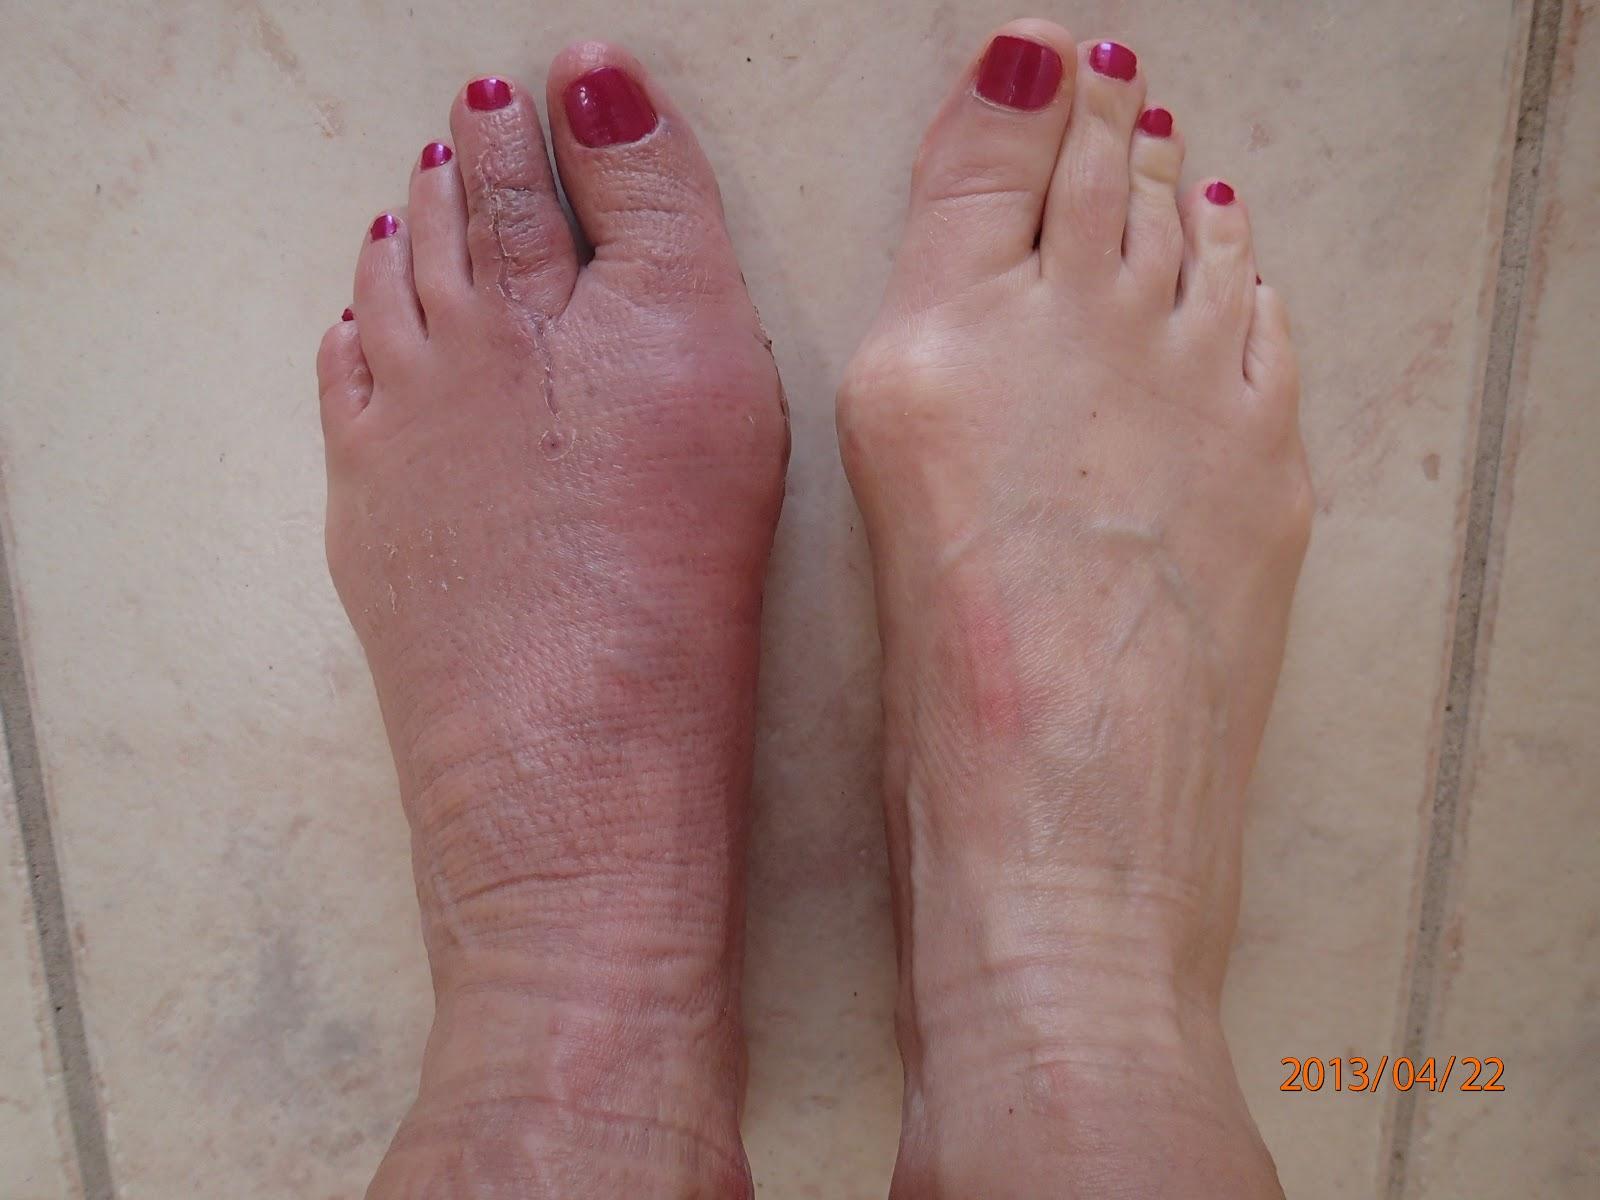 TORONTO FOOT BLOGGER - FOOT SPECIALIST, PODIATRIC MEDICINE